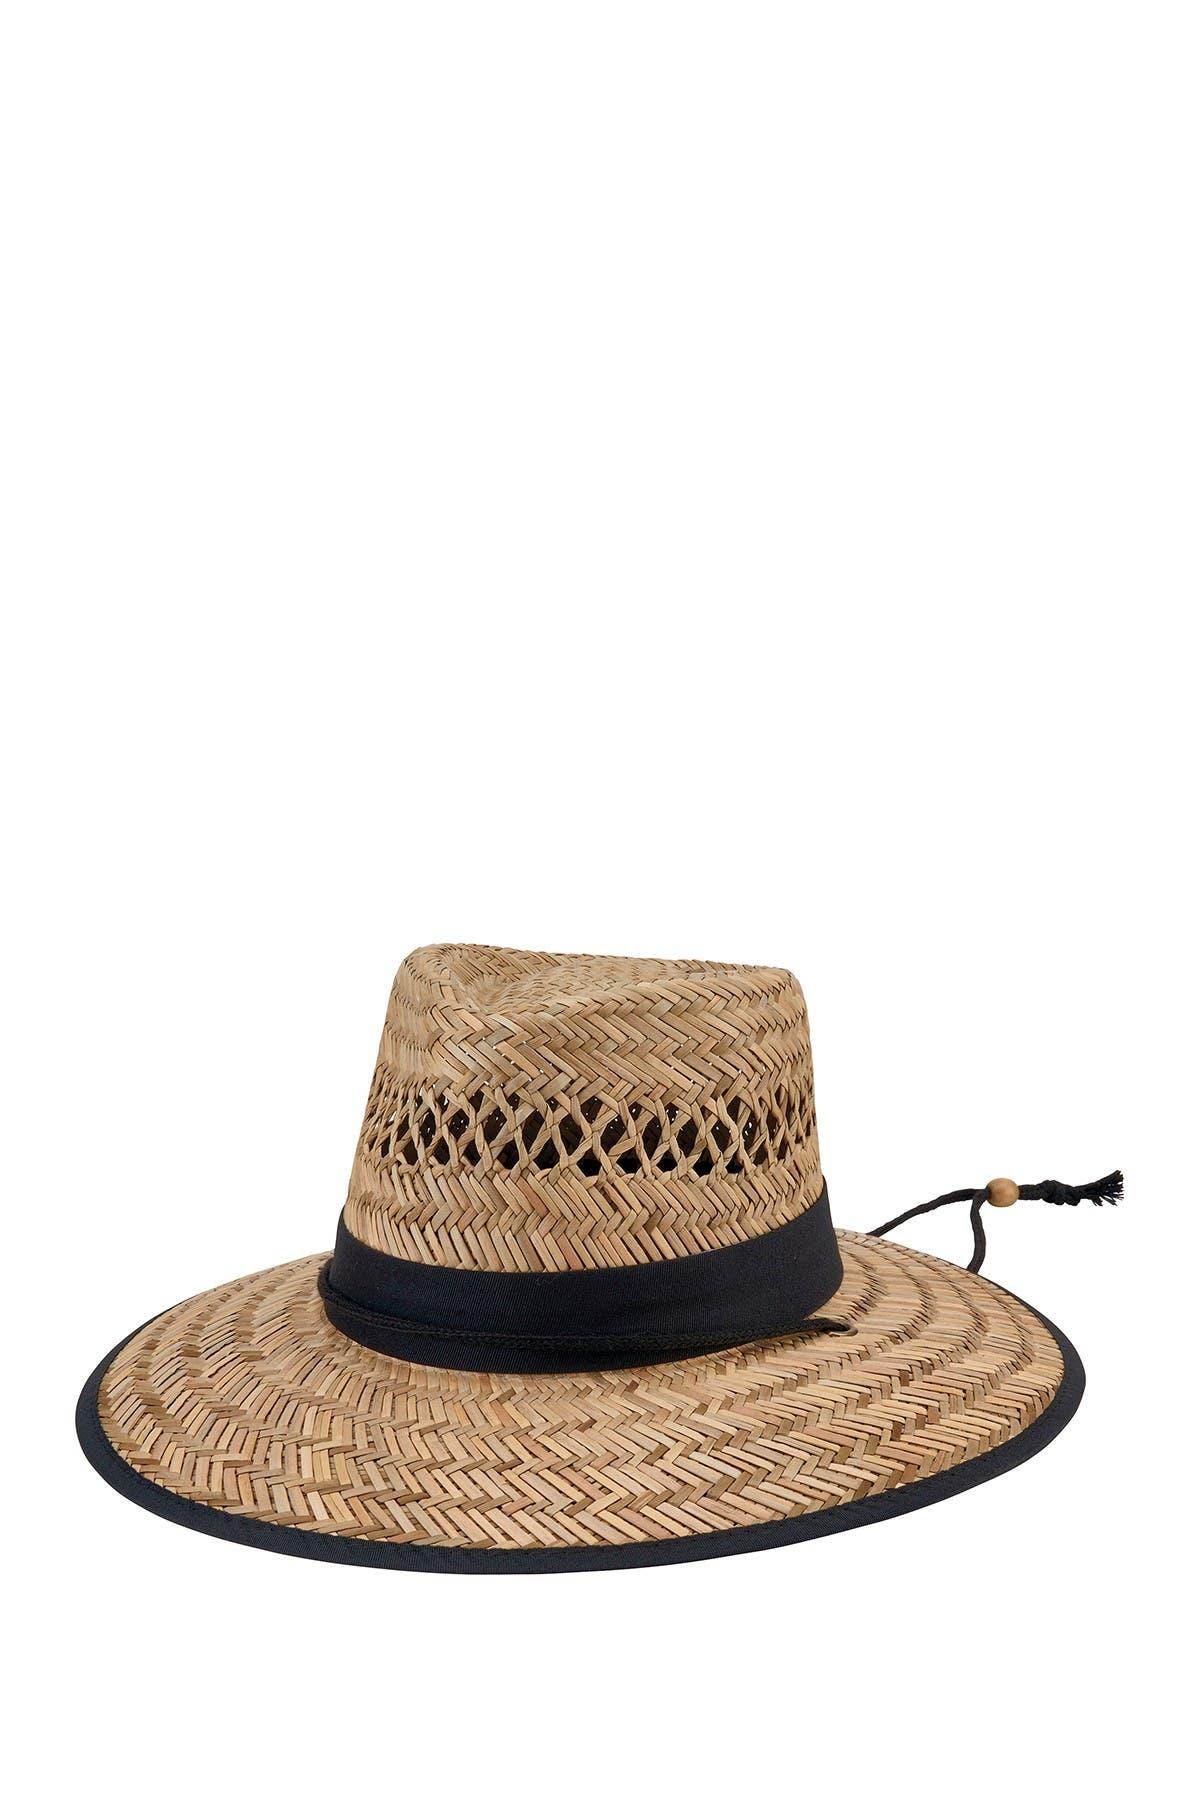 Image of SAN DIEGO HAT Rush Straw Lifeguard Hat